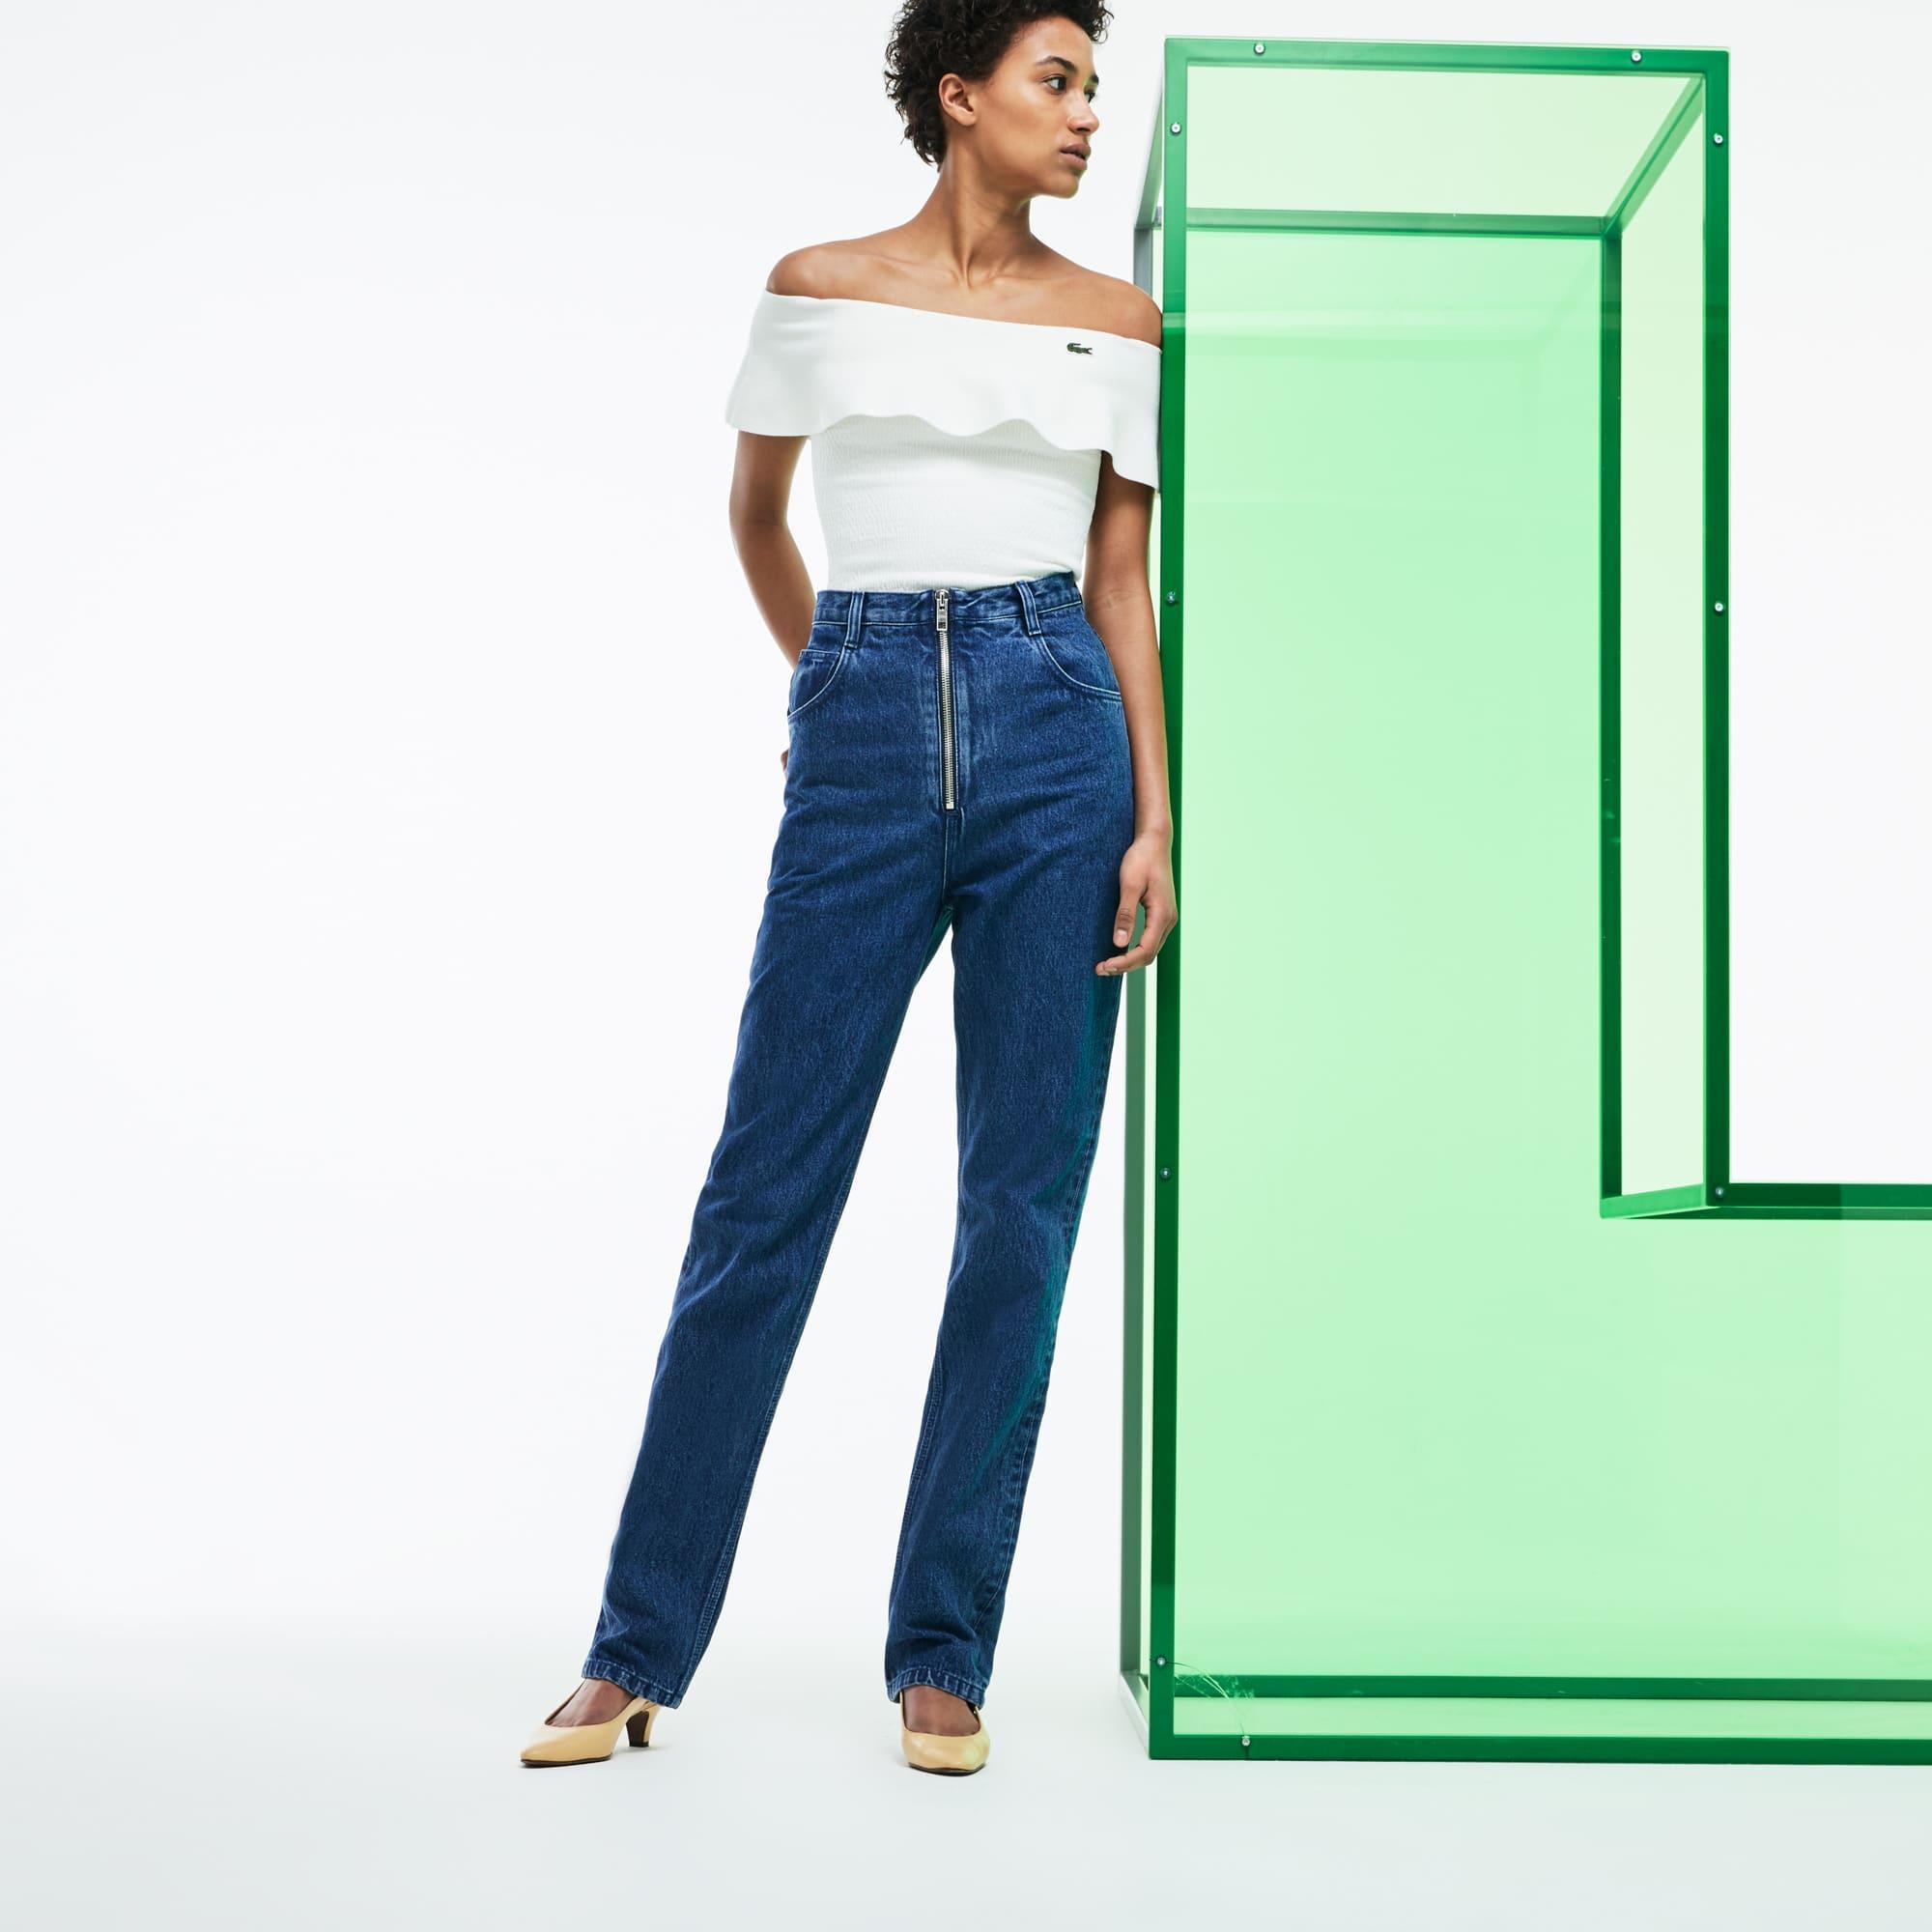 Women's Fashion Show High-Waisted Denim Jeans